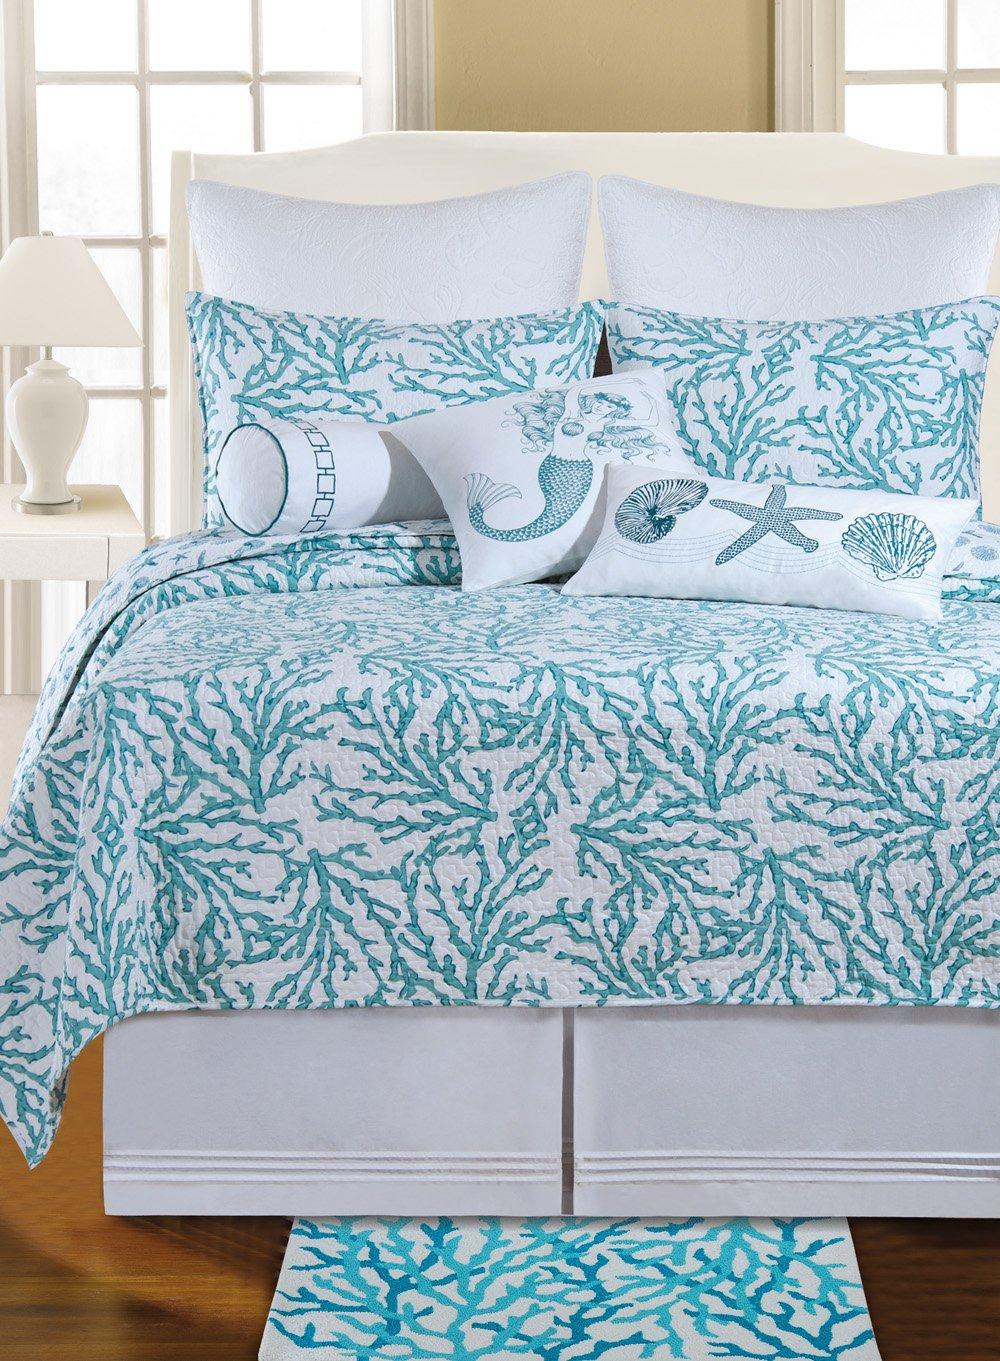 Amazon.com - C & F Enterprises Cora Blue King Quilt - Beach Bedding